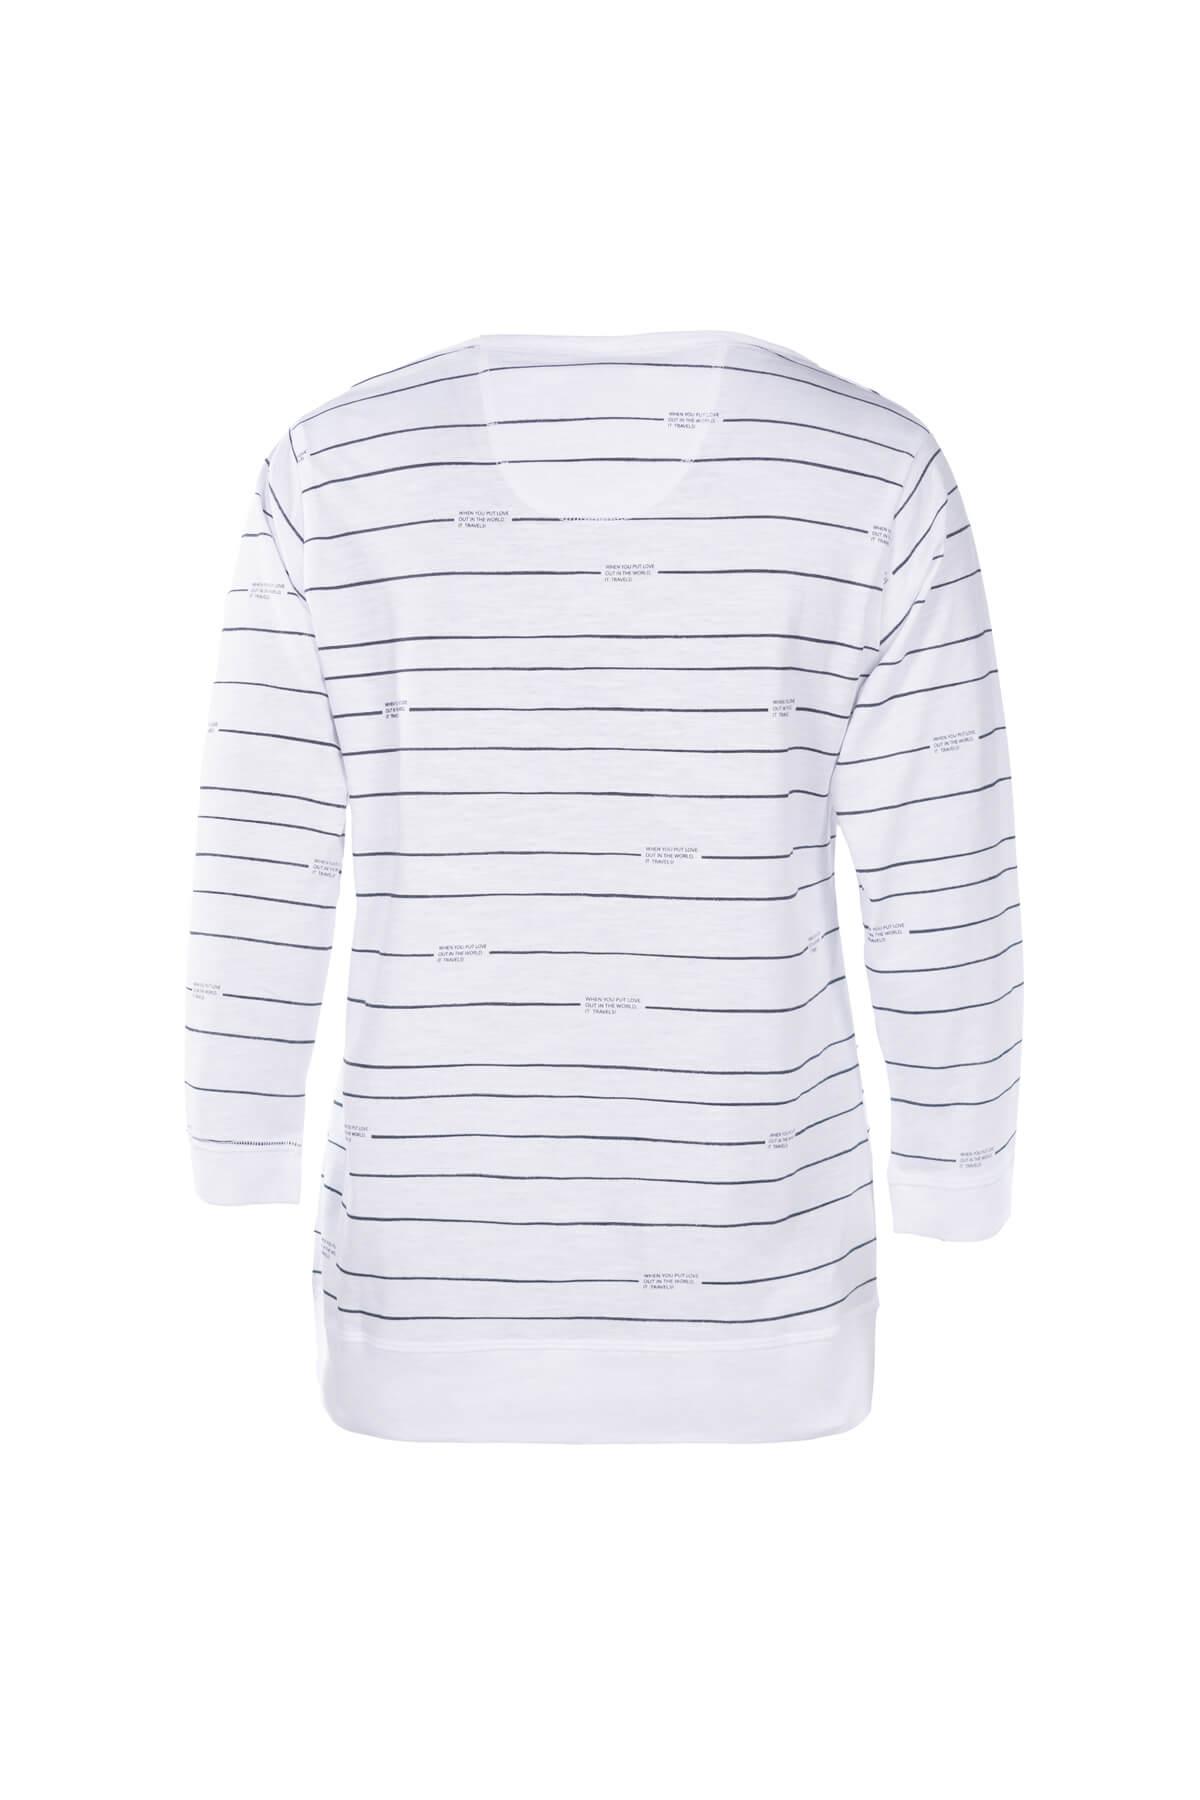 Soquesto Shirt Kathi